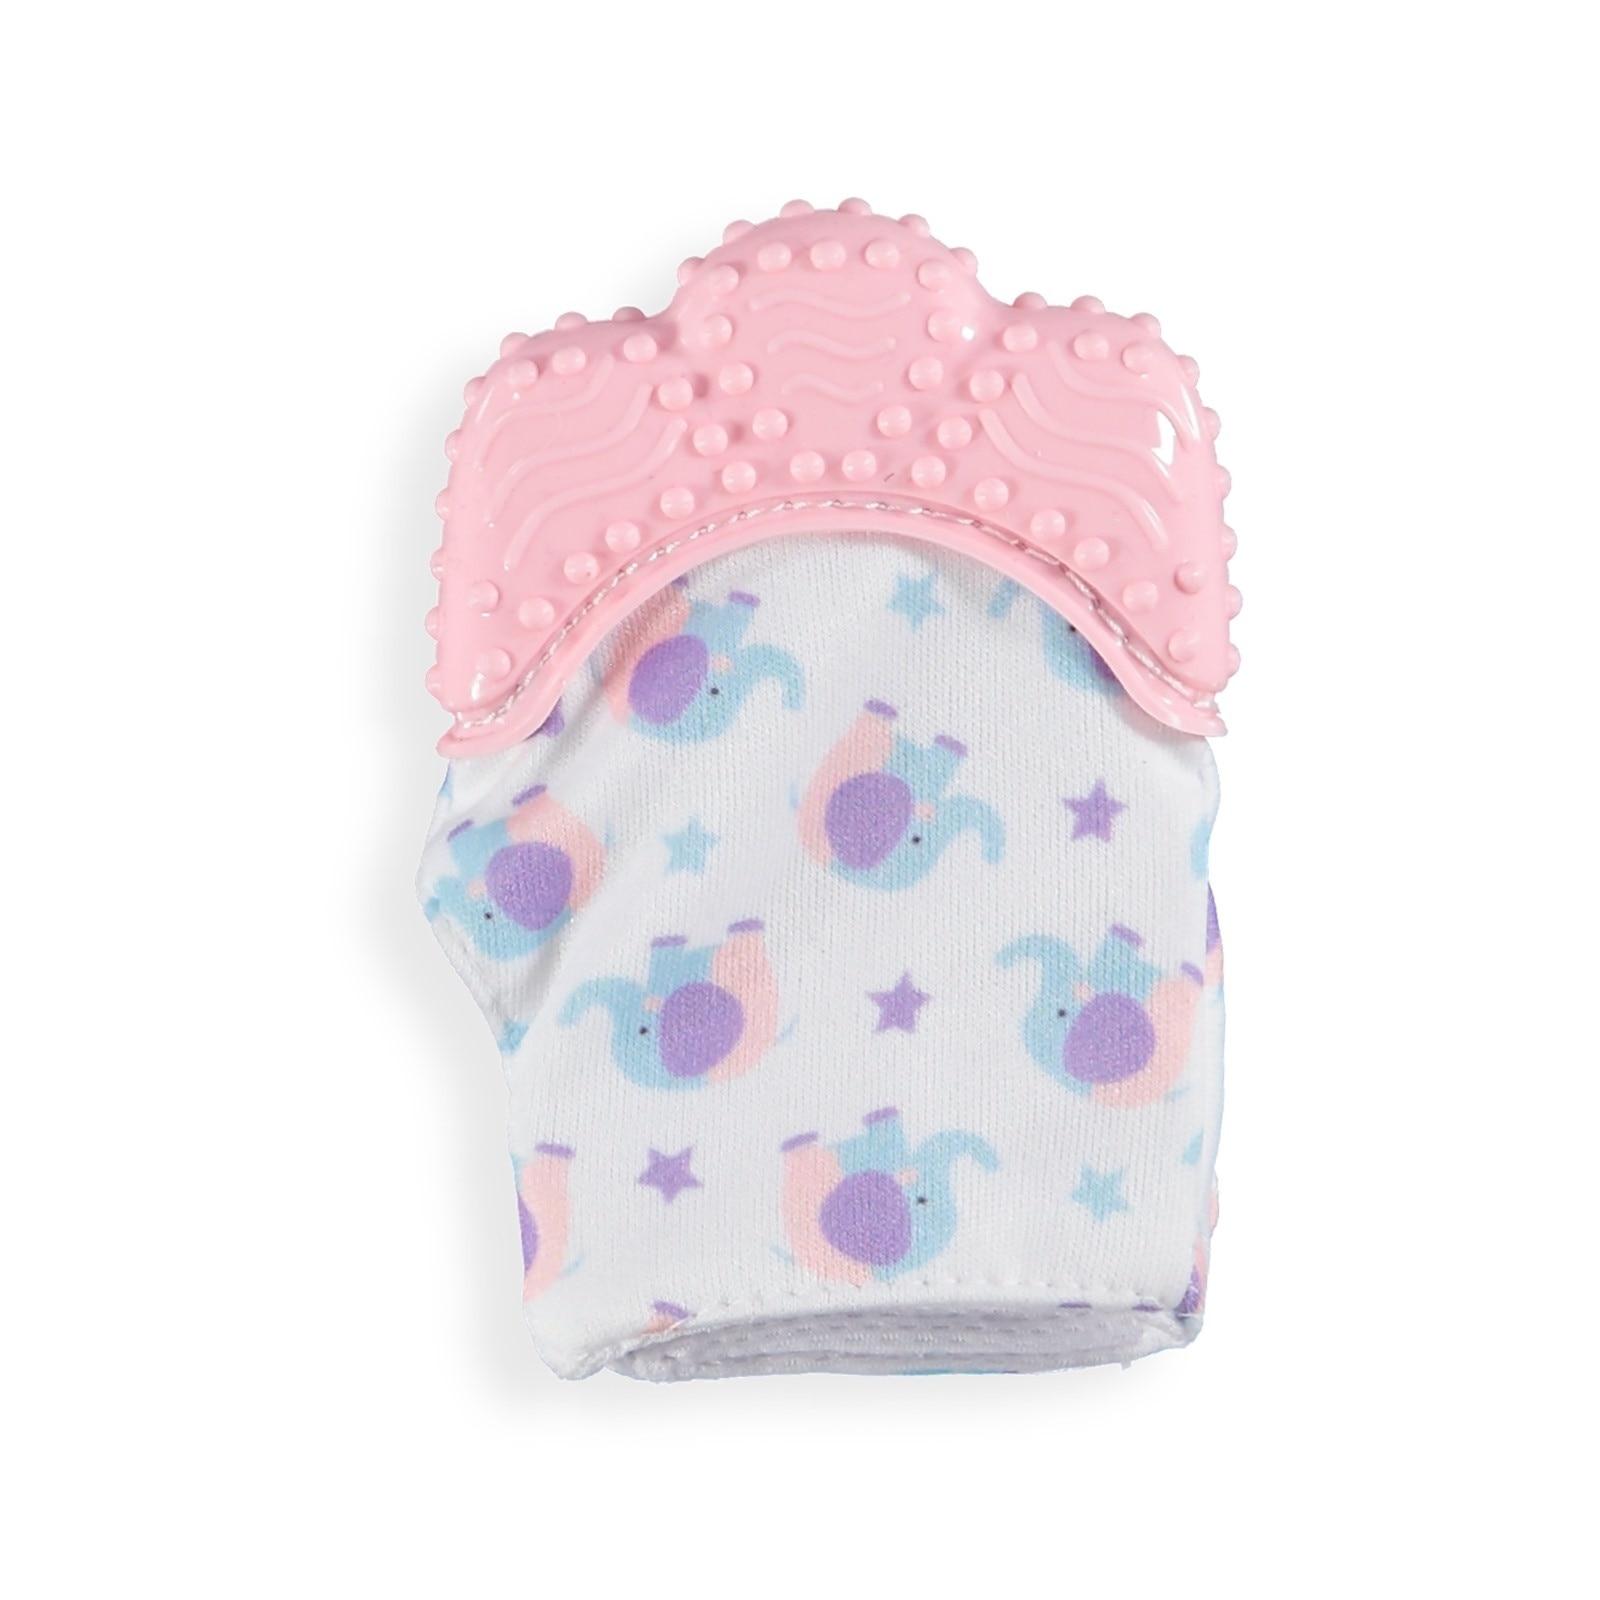 Ebebek Baby&toys Baby Teether Glove Pink